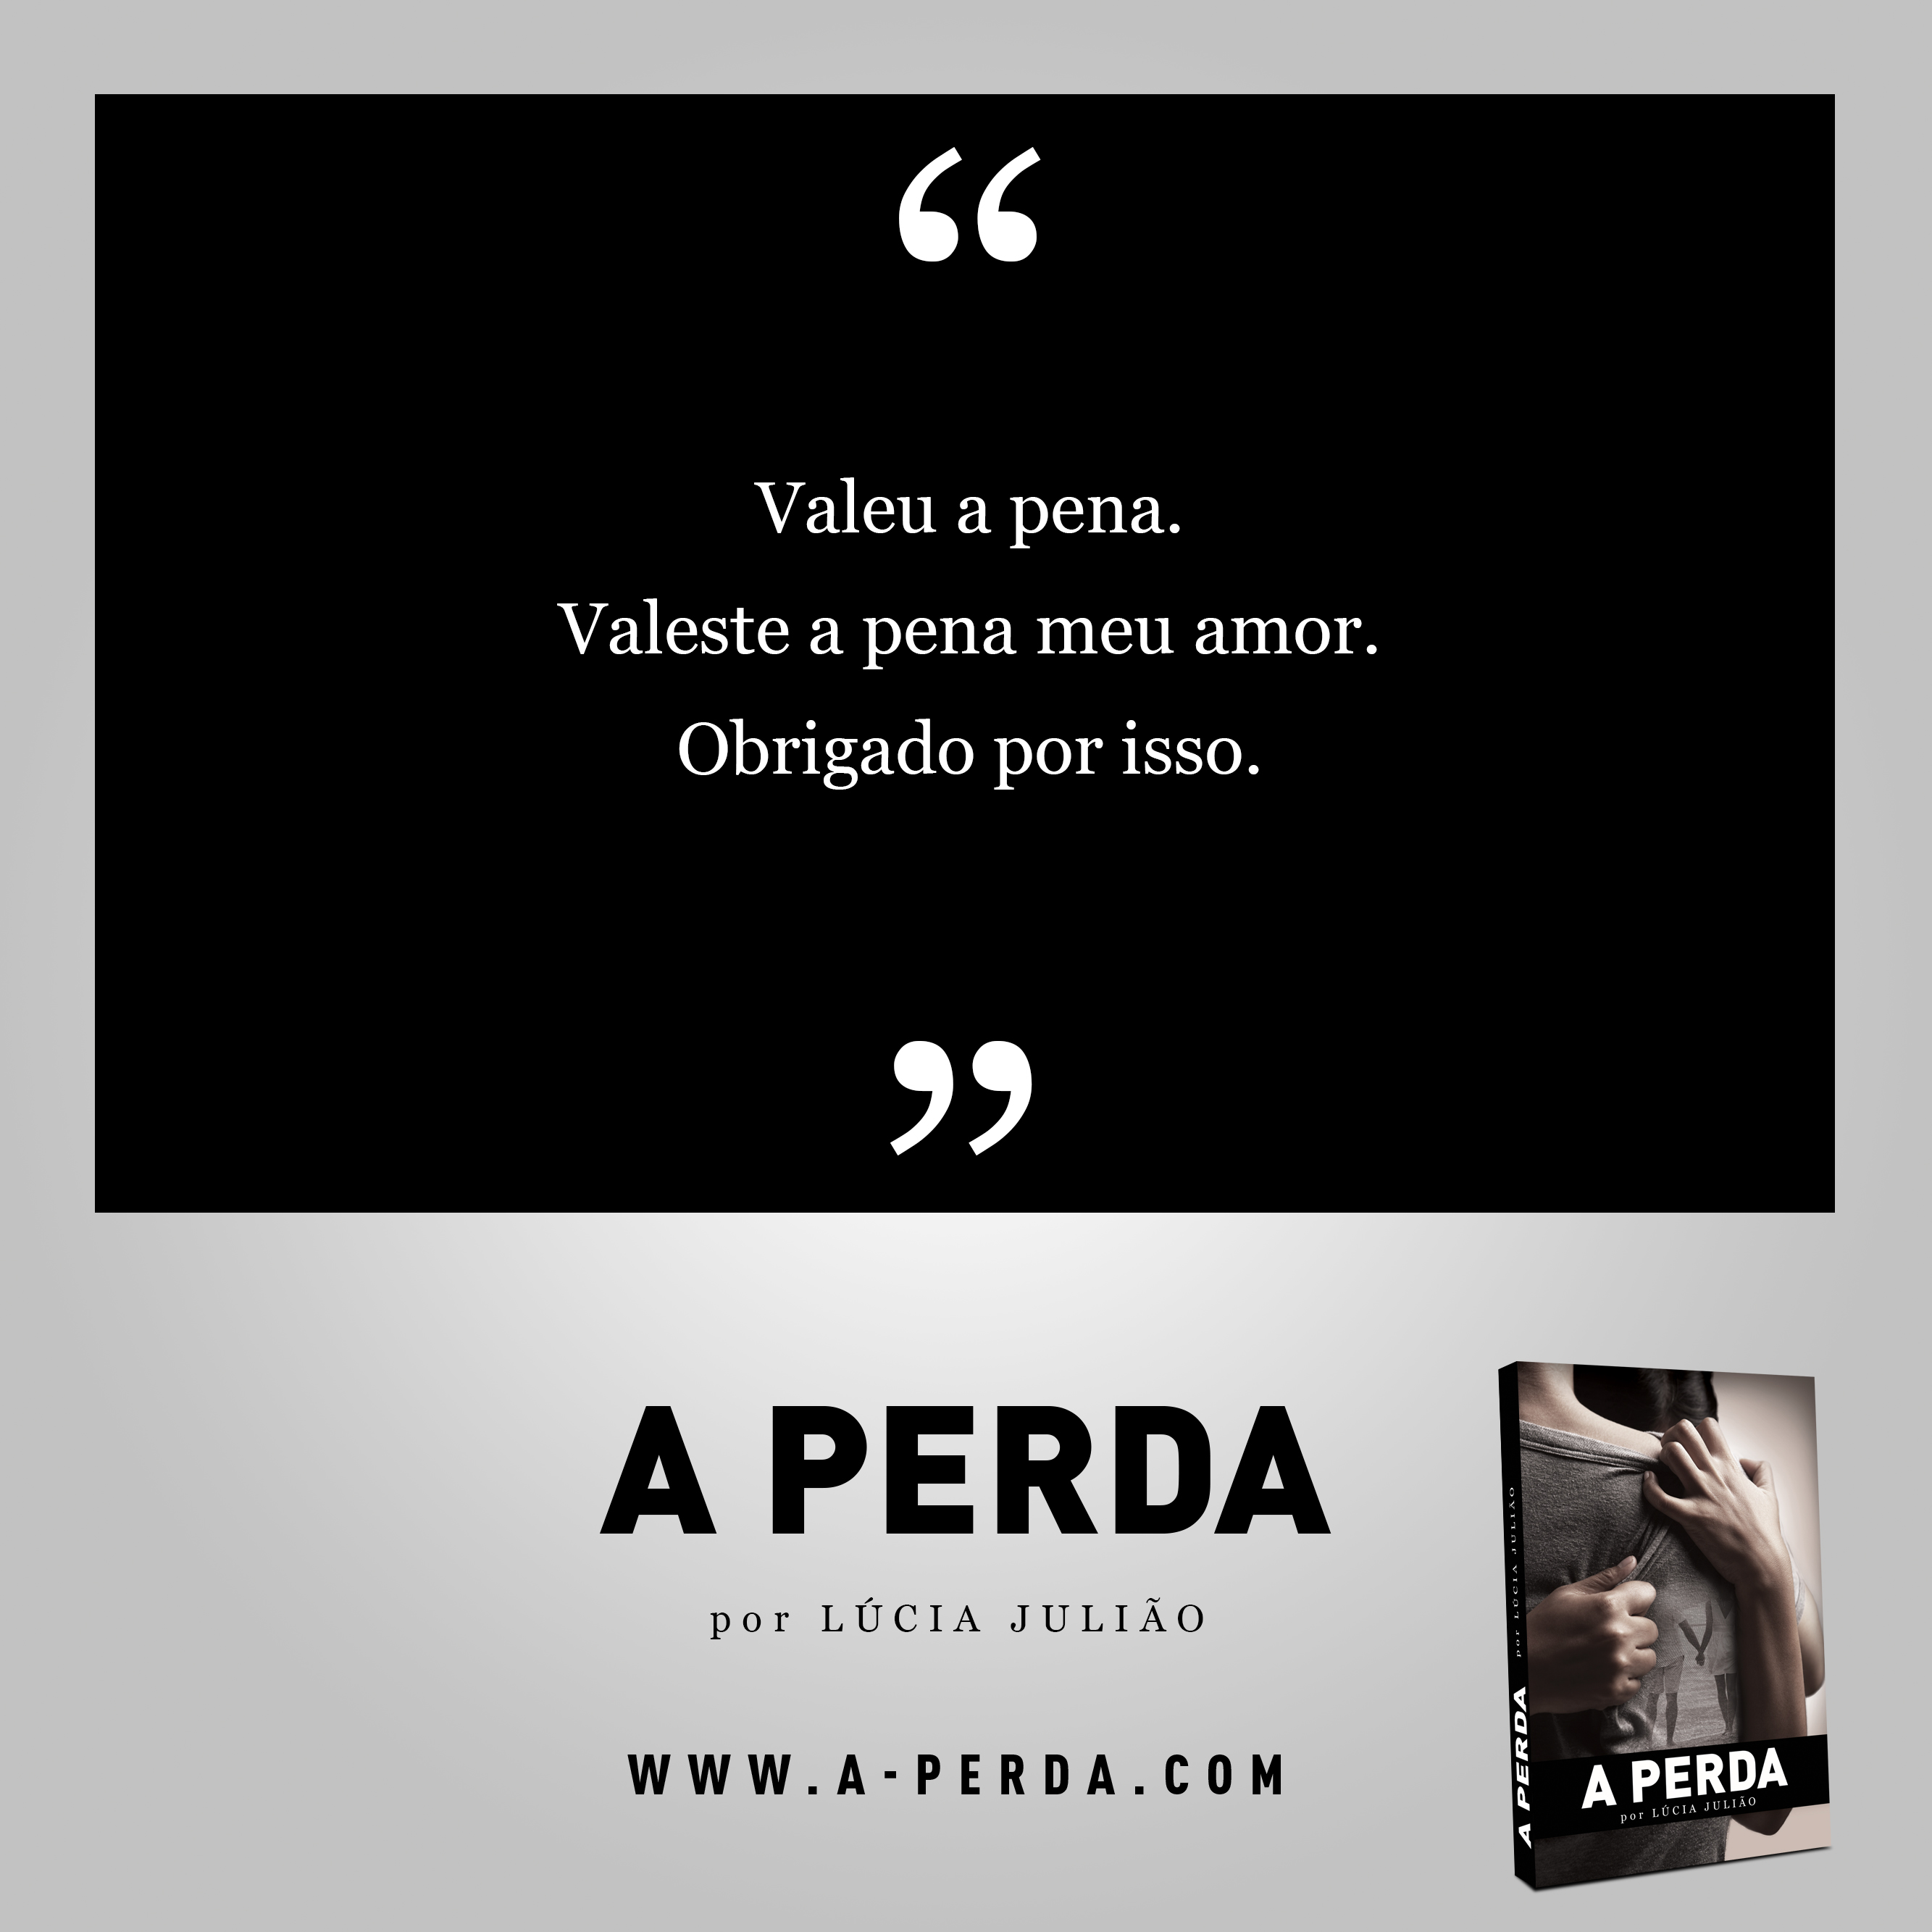 020-capitulo-12-livro-a-Perda-de-Lucia-Juliao-Instagram